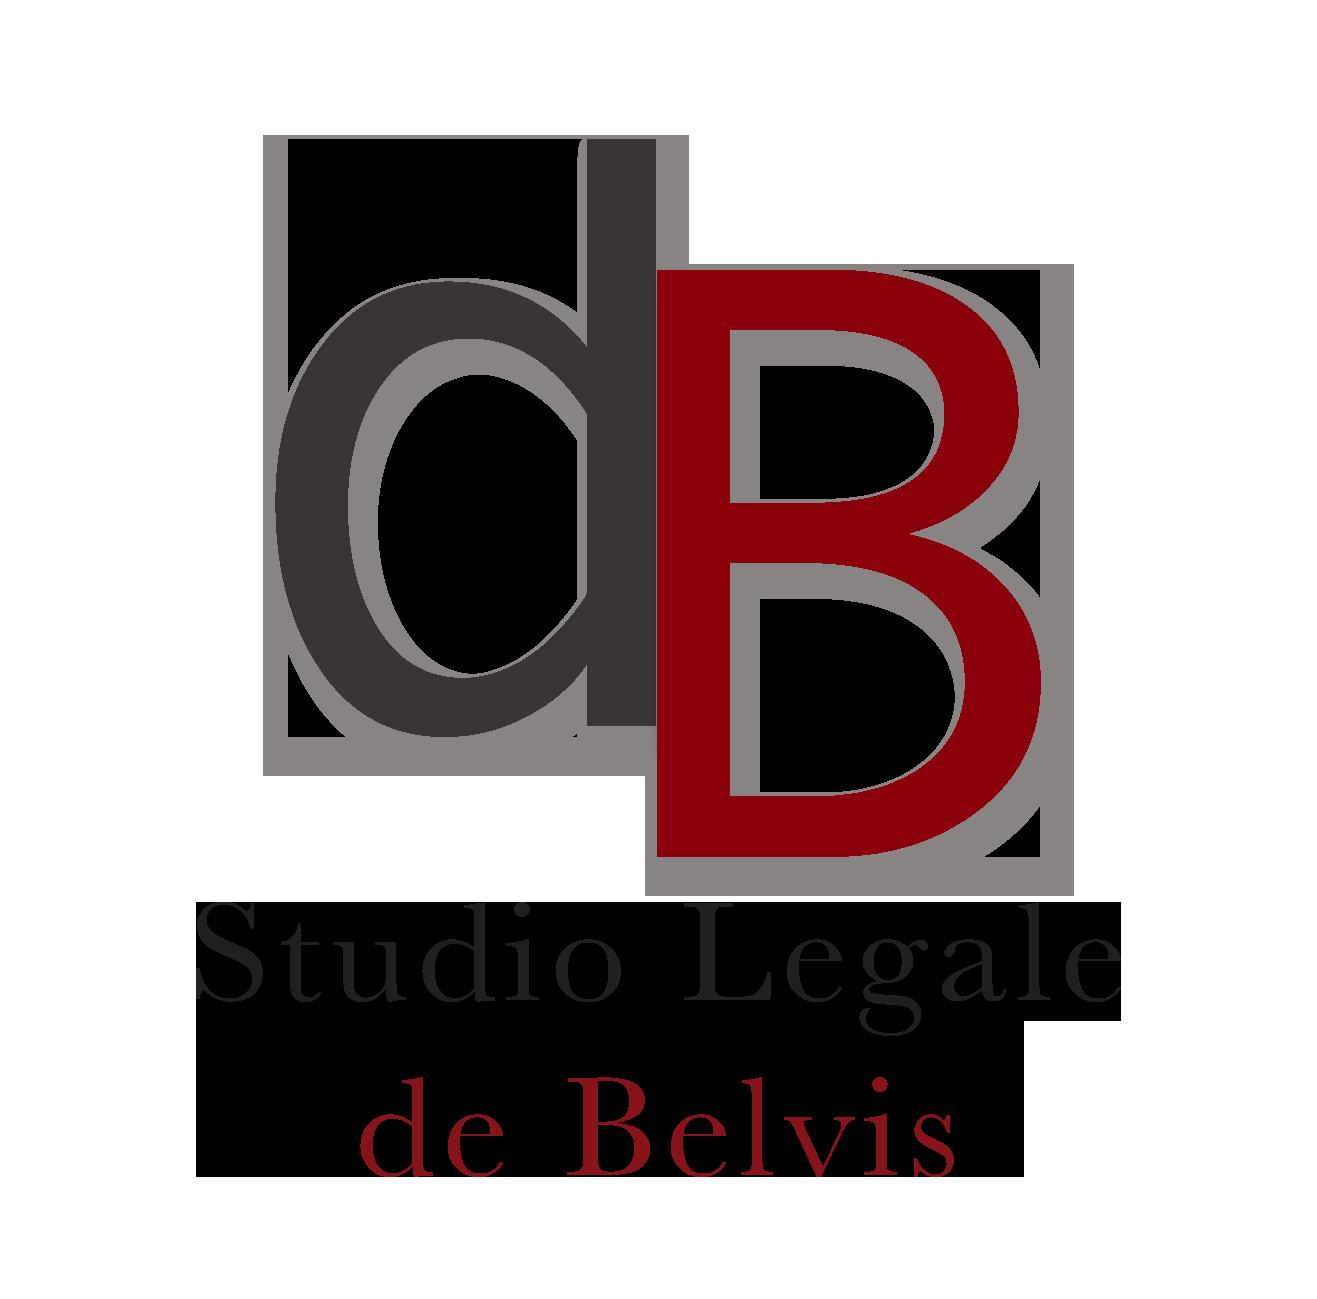 Studio Legale de Belvis